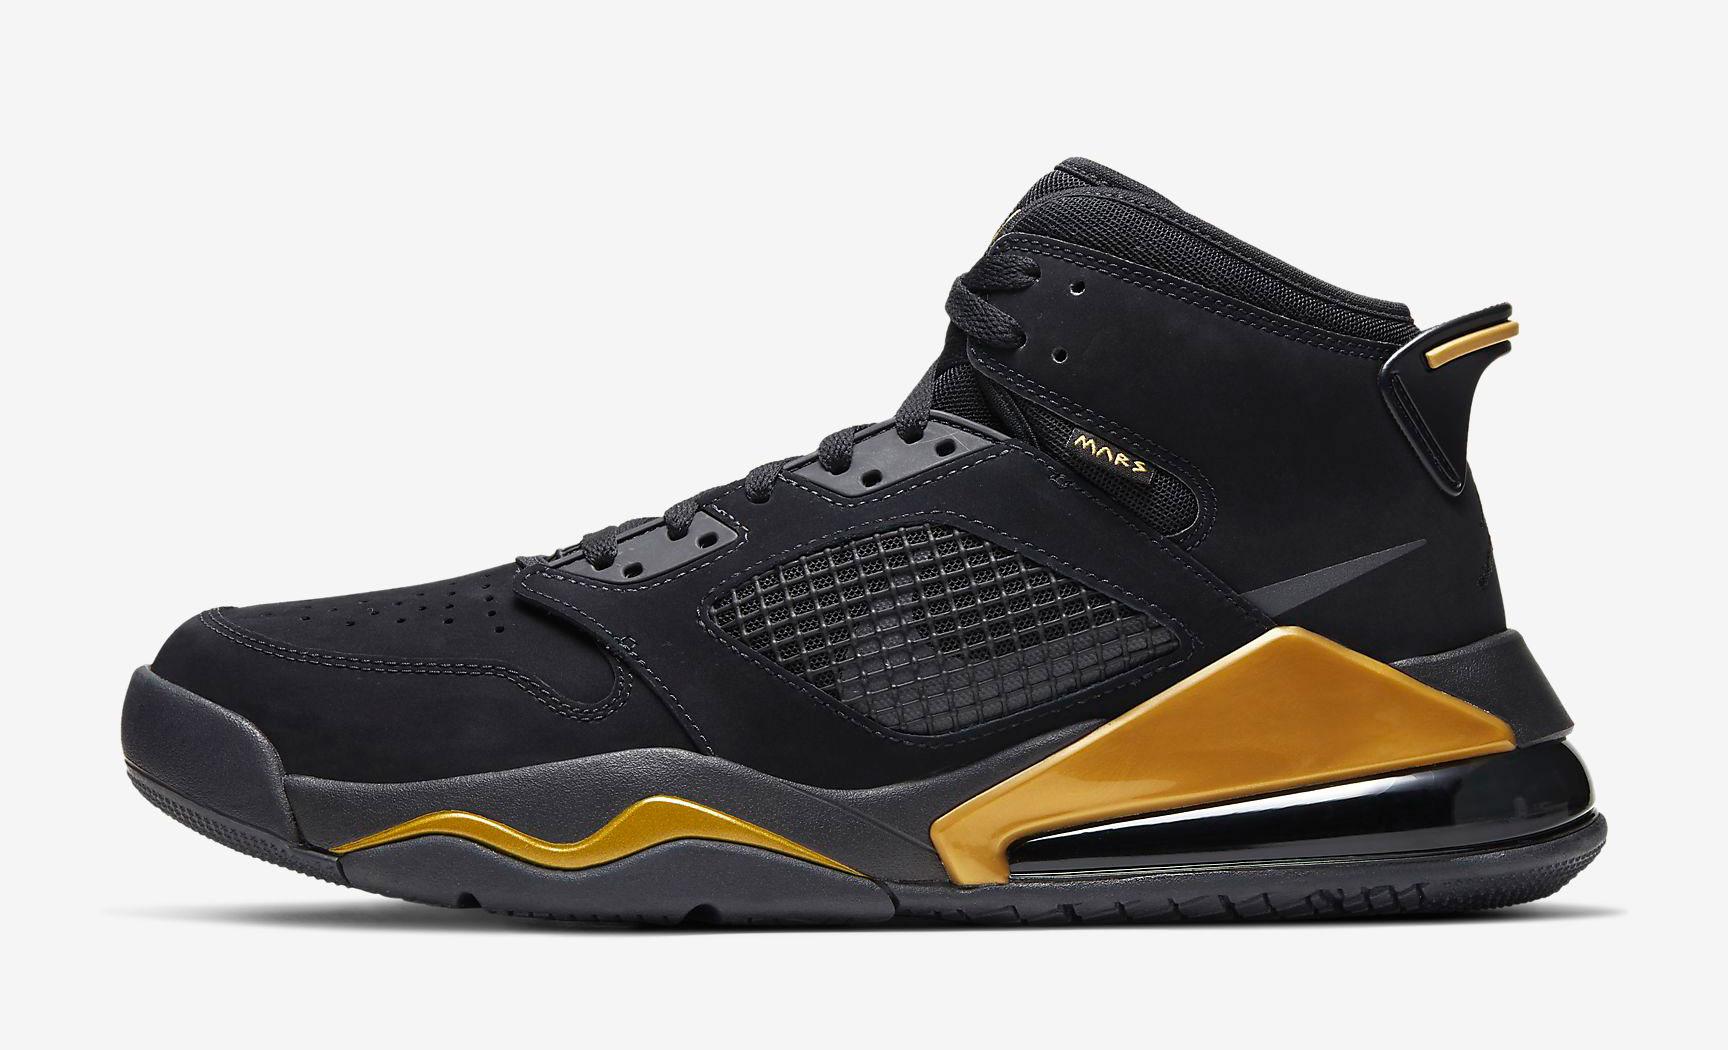 jordan-mars-270-black-gold-release-date